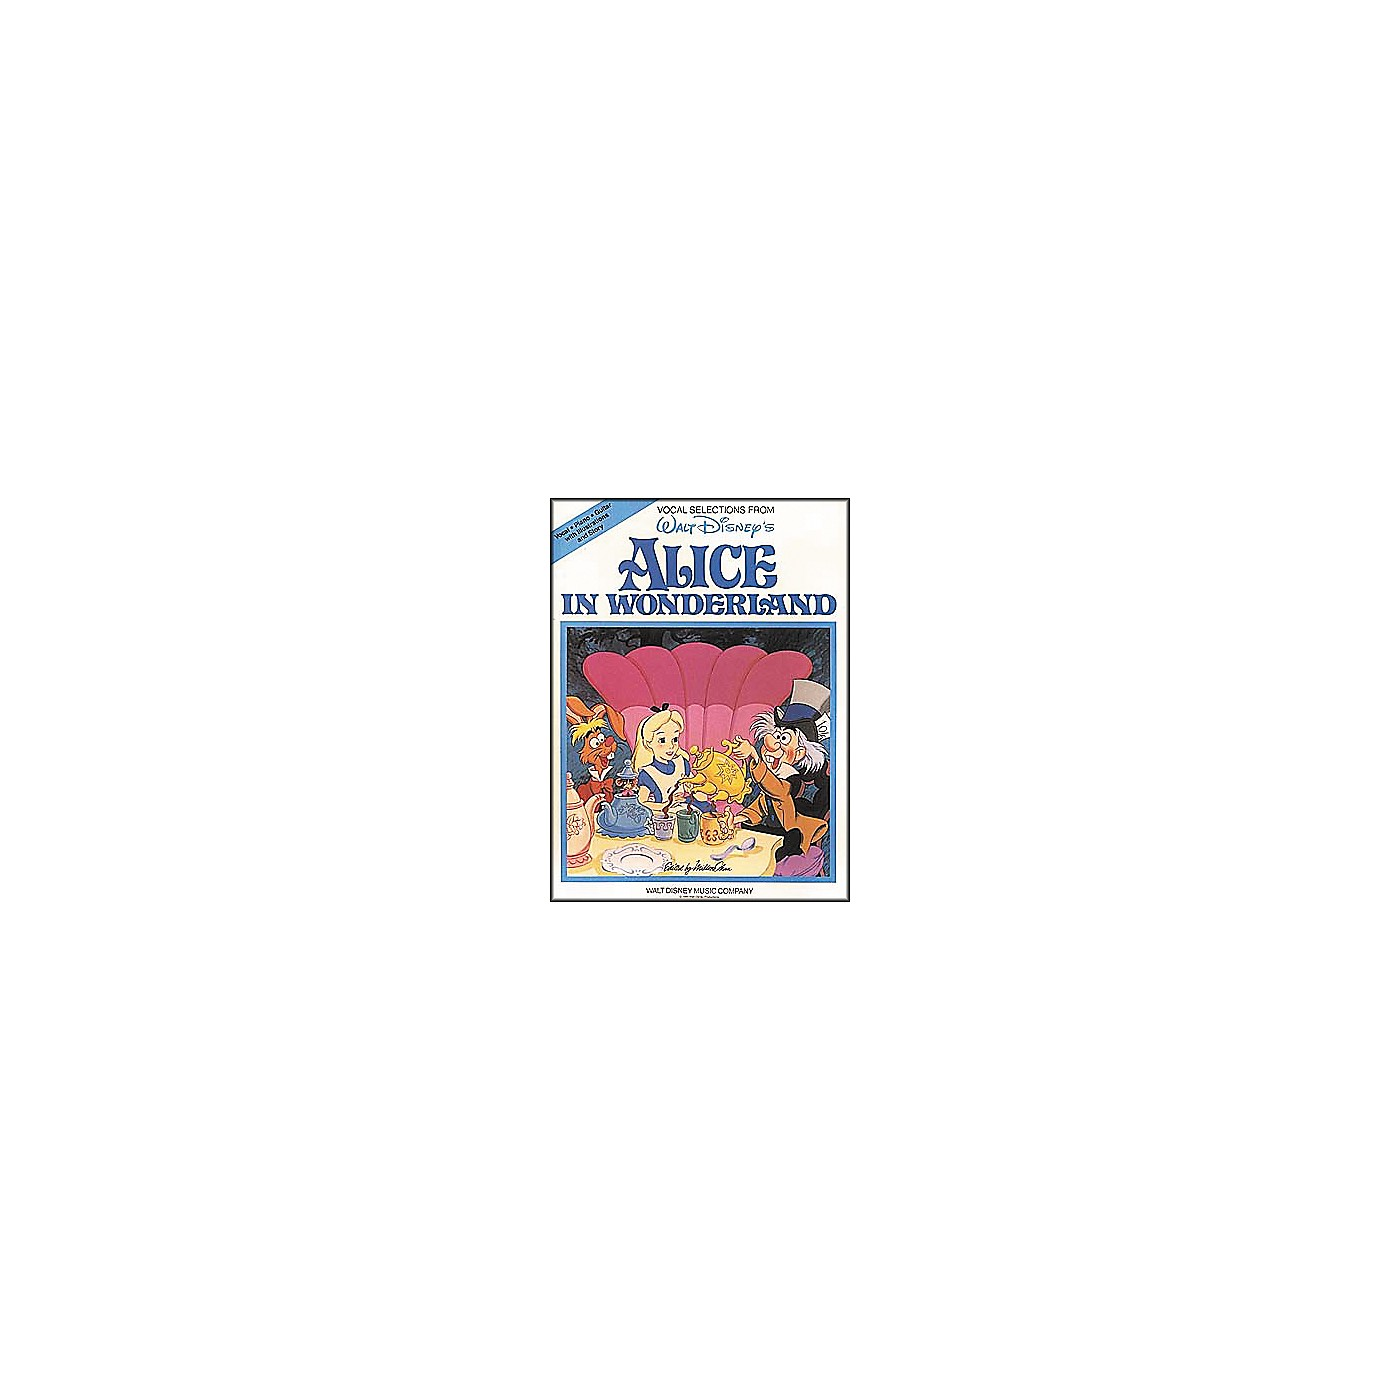 Hal Leonard Alice in Wonderland Piano, Vocal, Guitar Songbook thumbnail